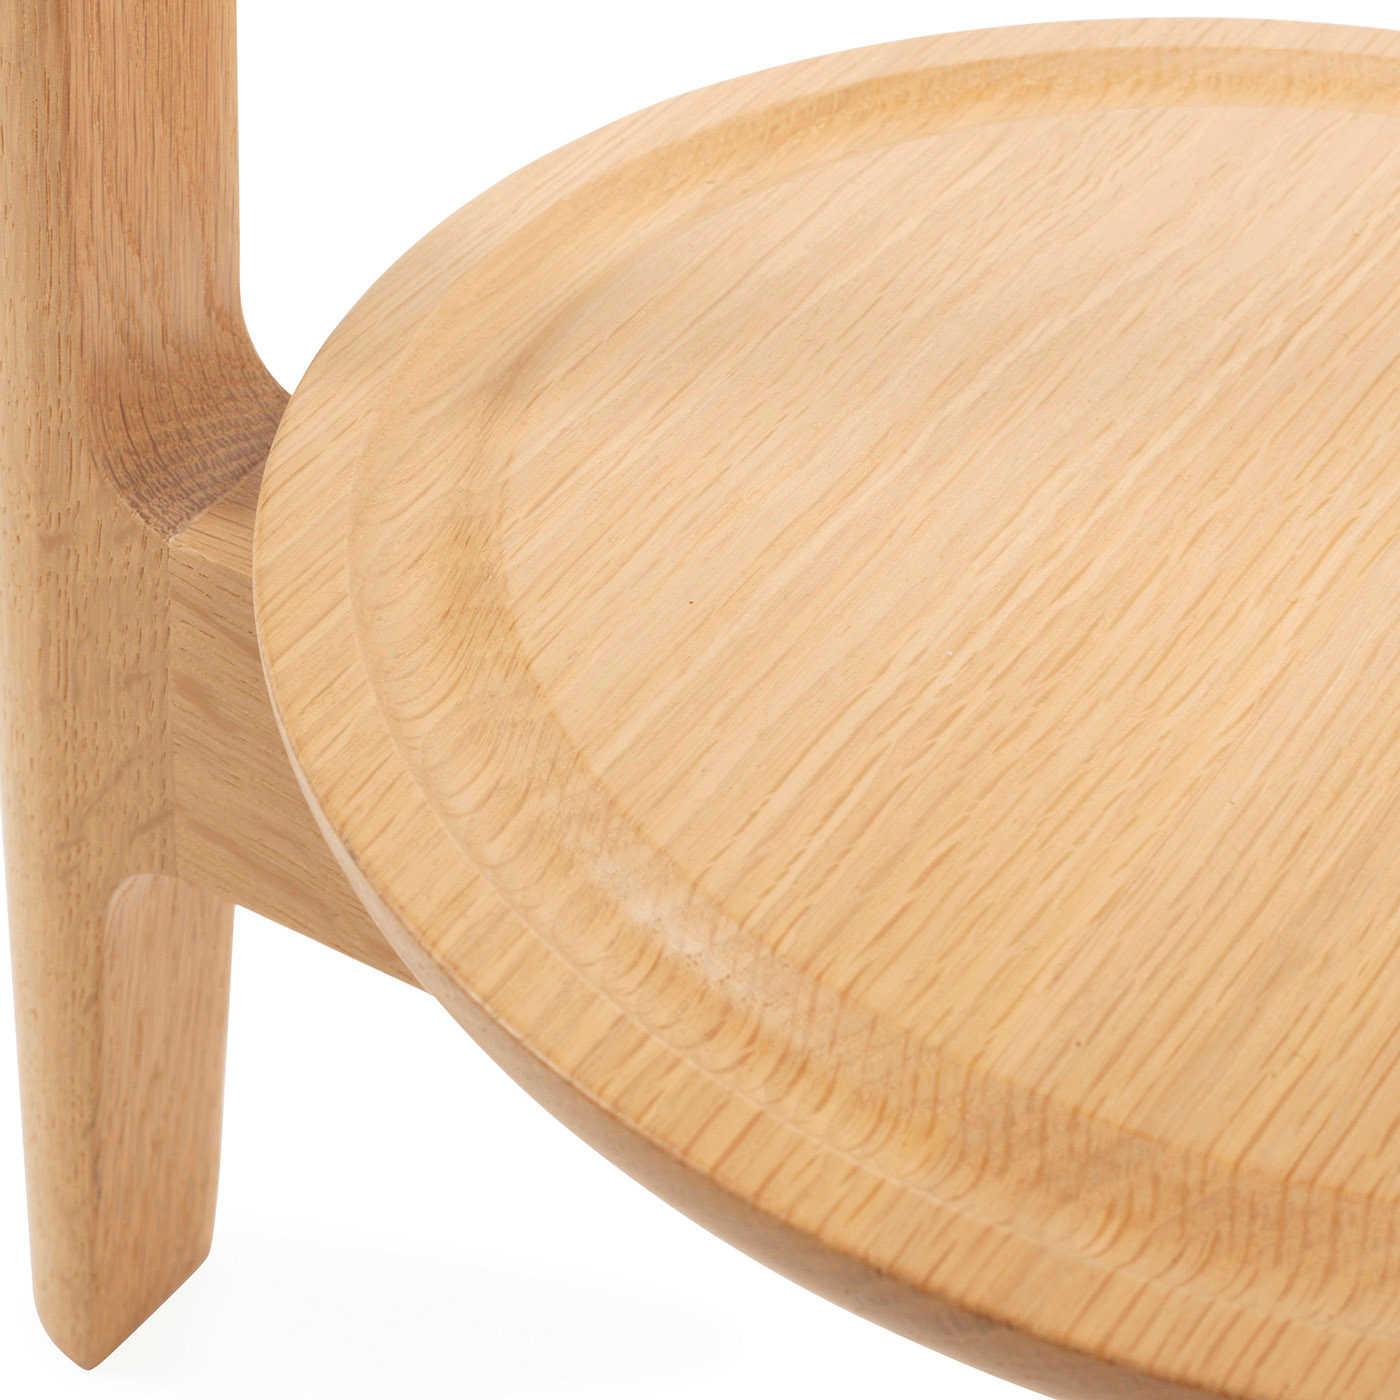 Ercol svelto lamp table aloadofball Images